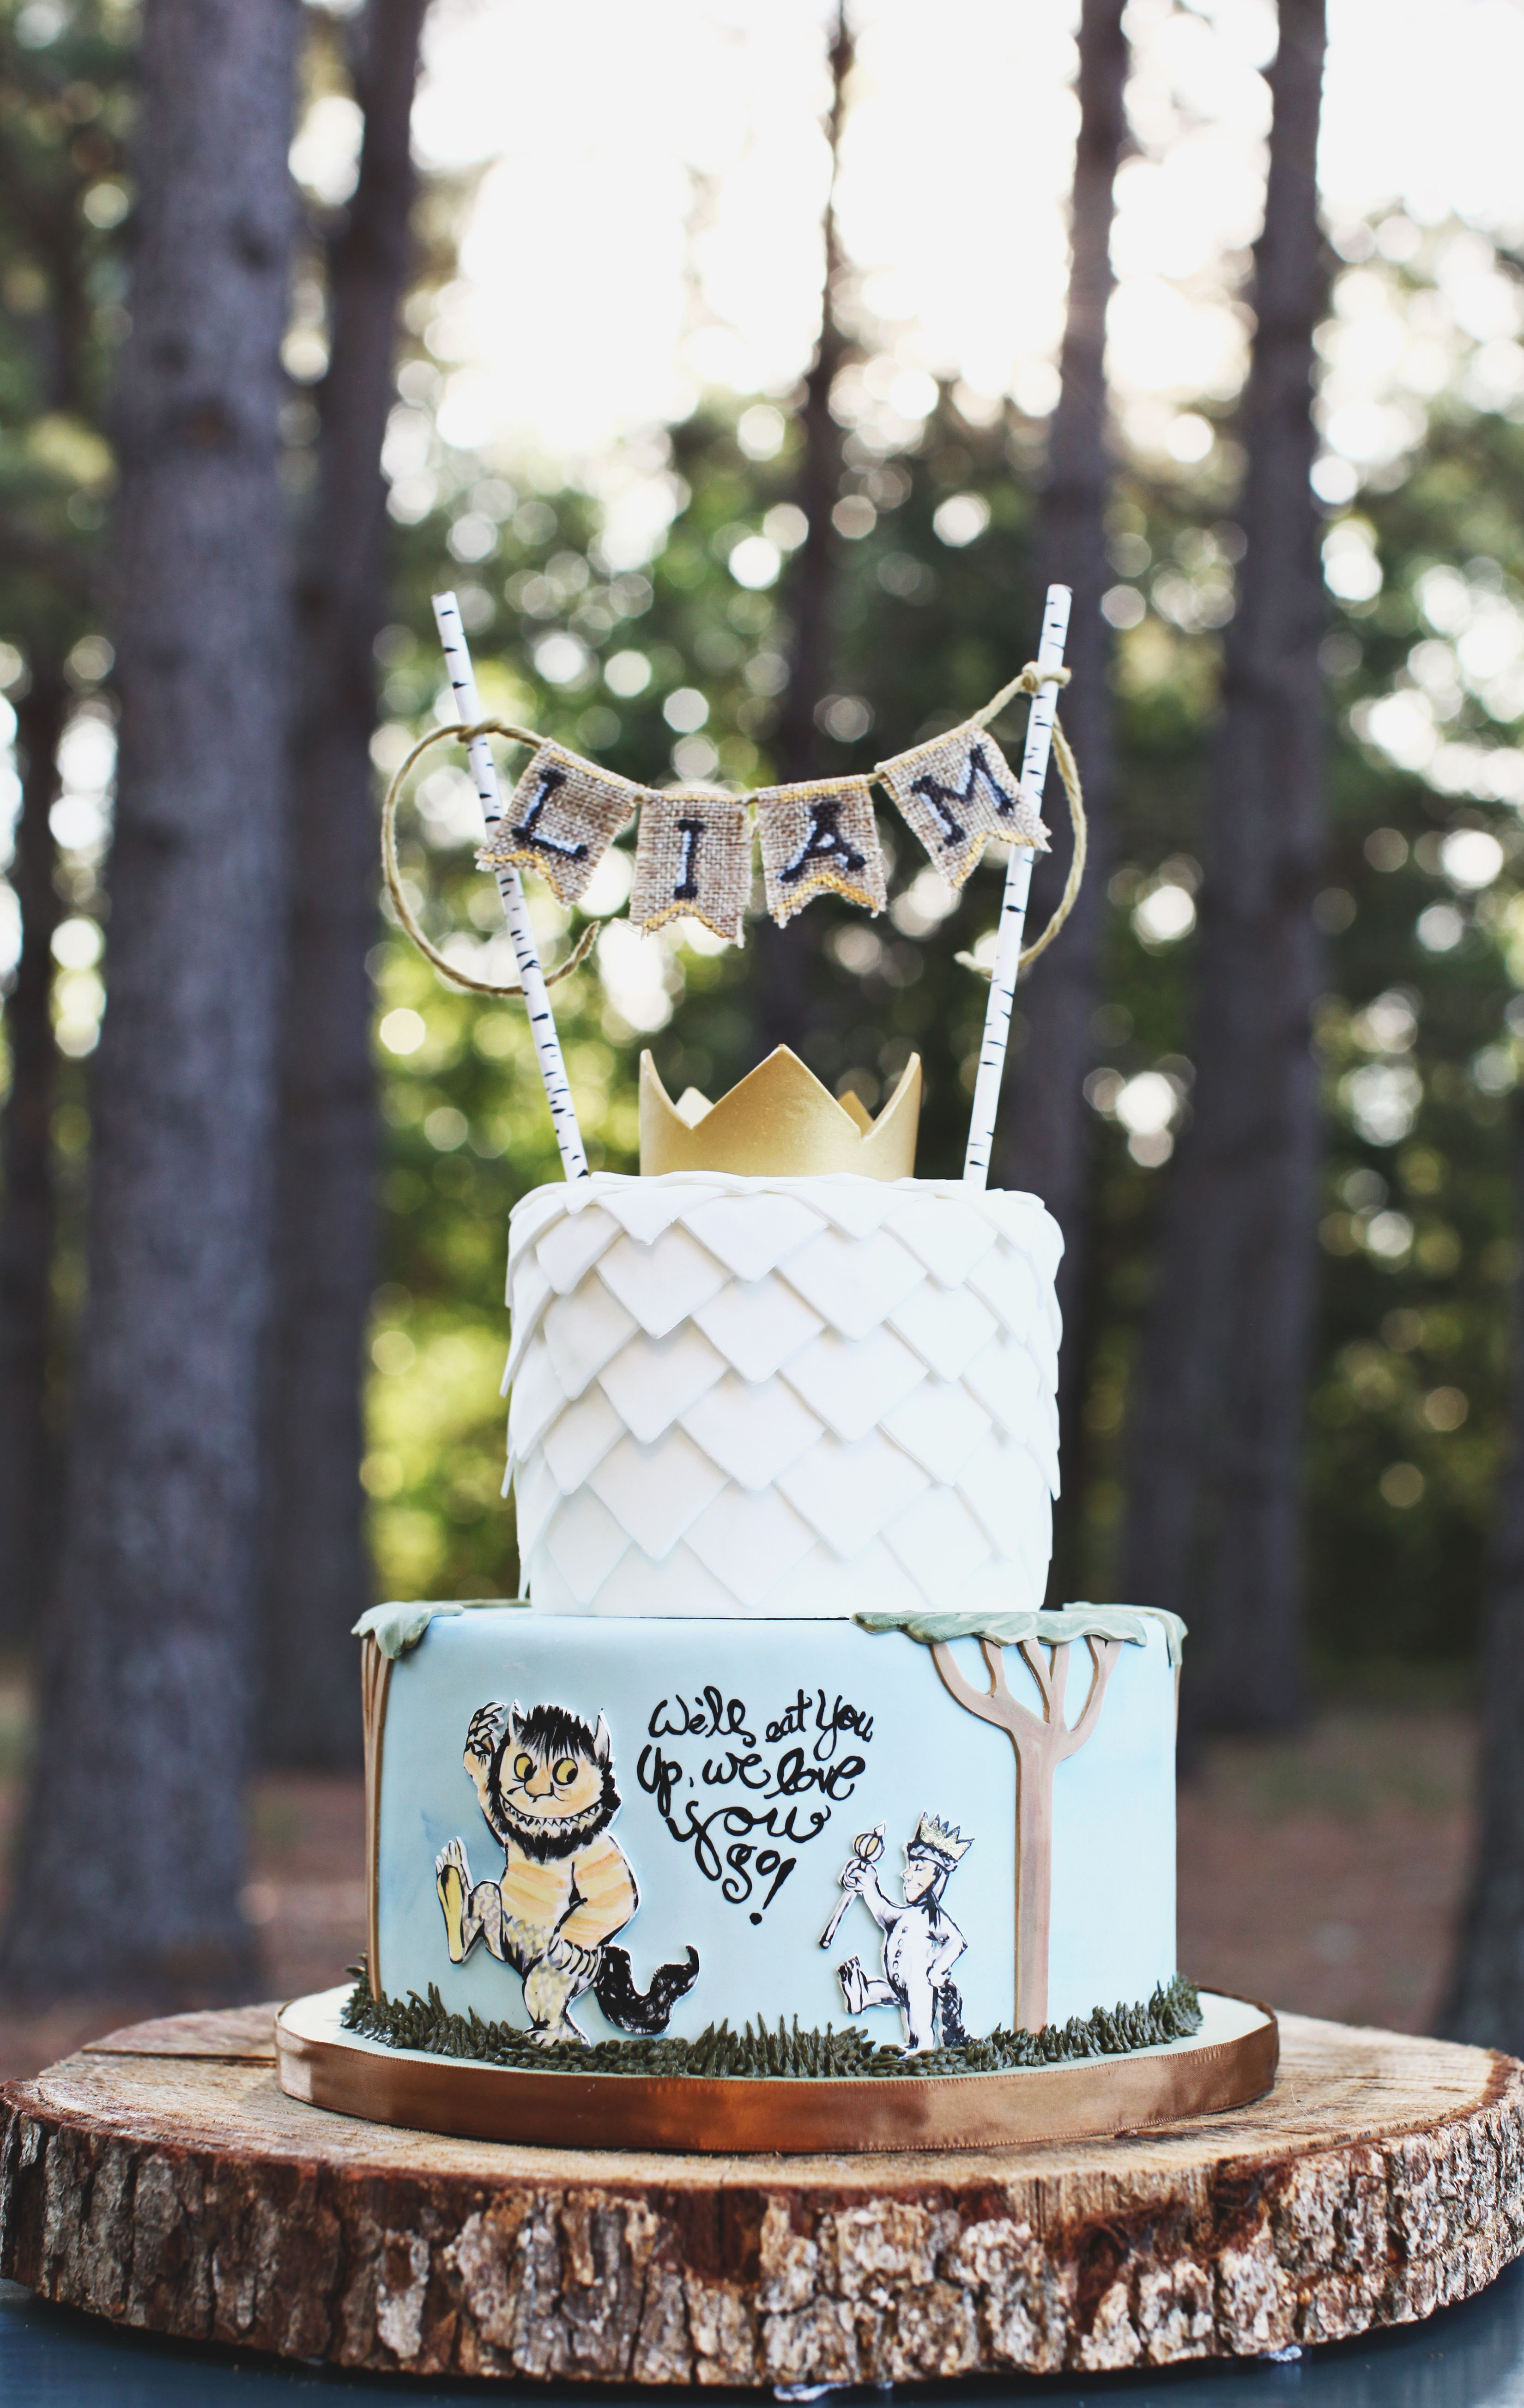 Where The Wild Things Are Cake Birthday Pinterest Wild Things